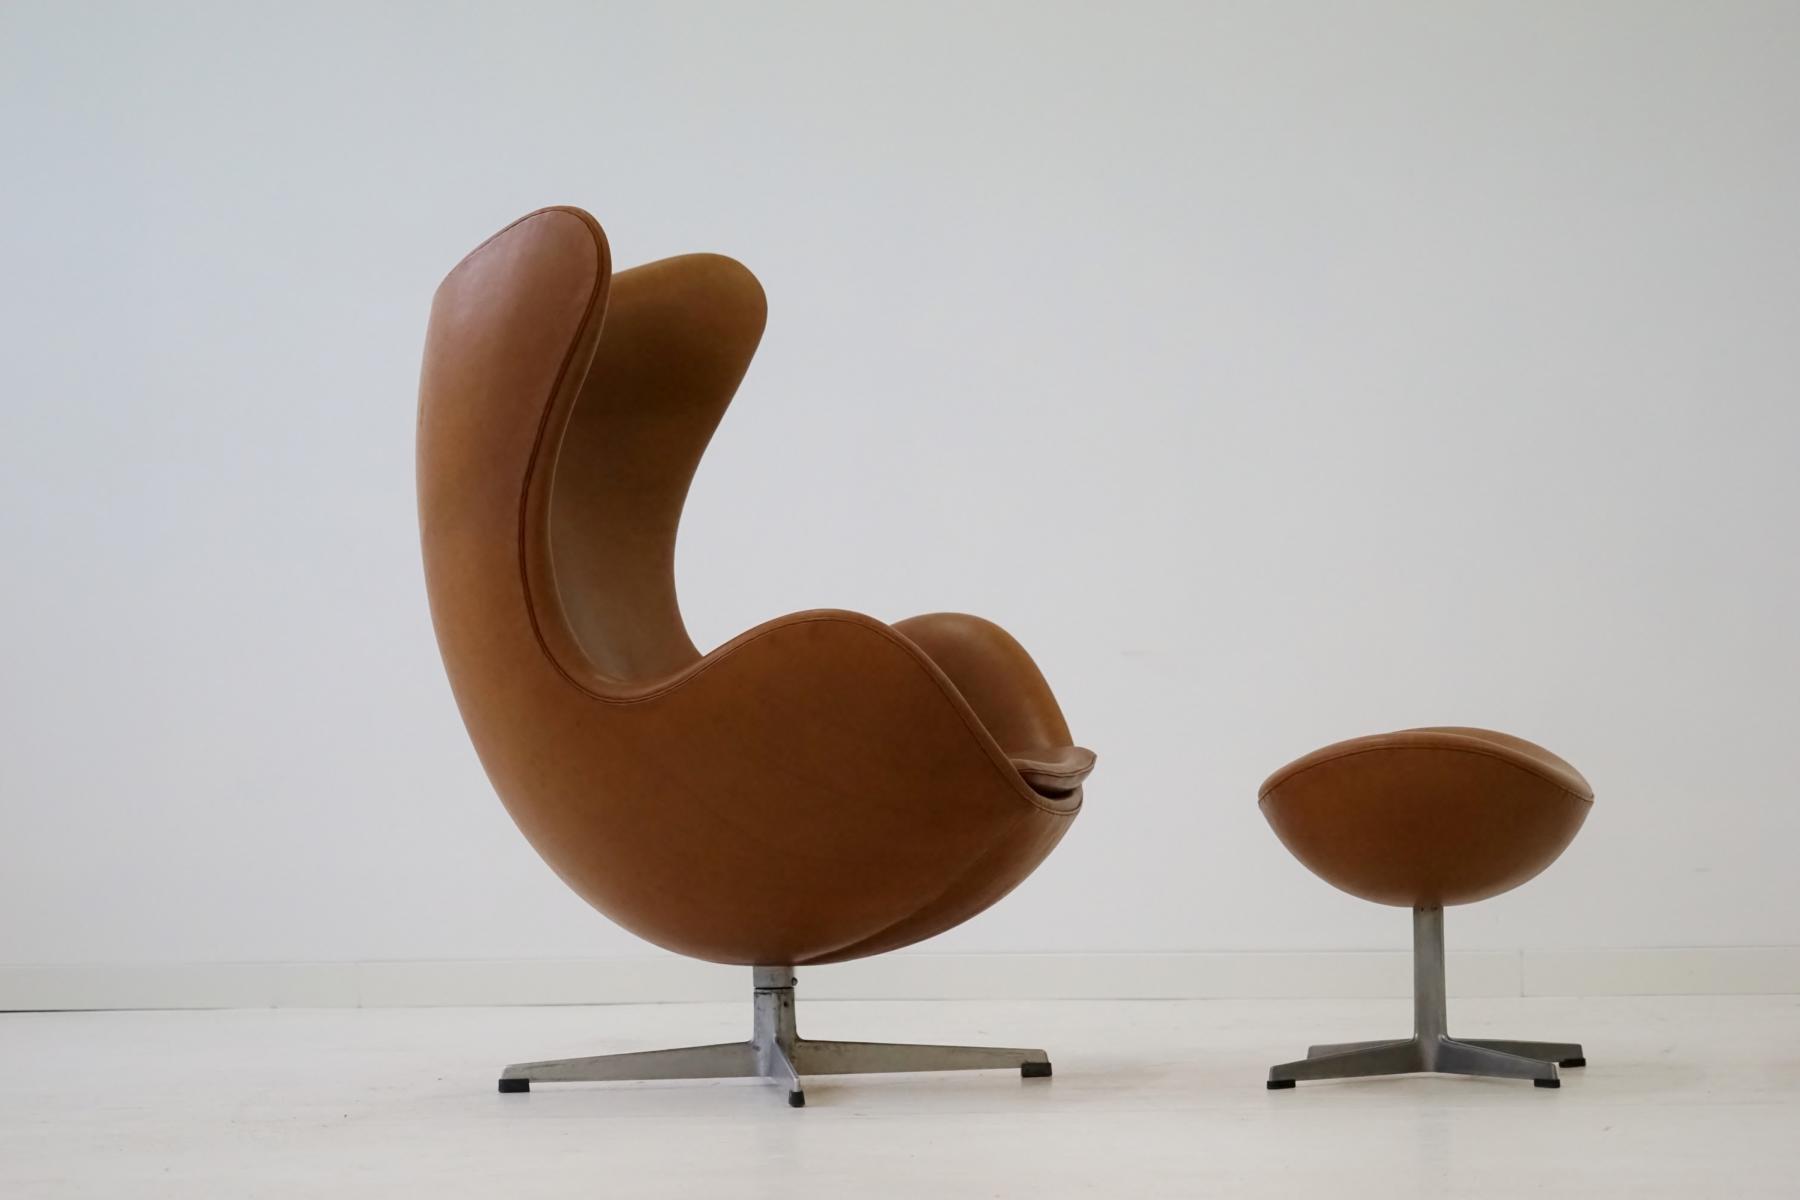 Leather Egg Lounge Chair U0026 Ottoman By Arne Jacobsen For Fritz Hansen, 1960s